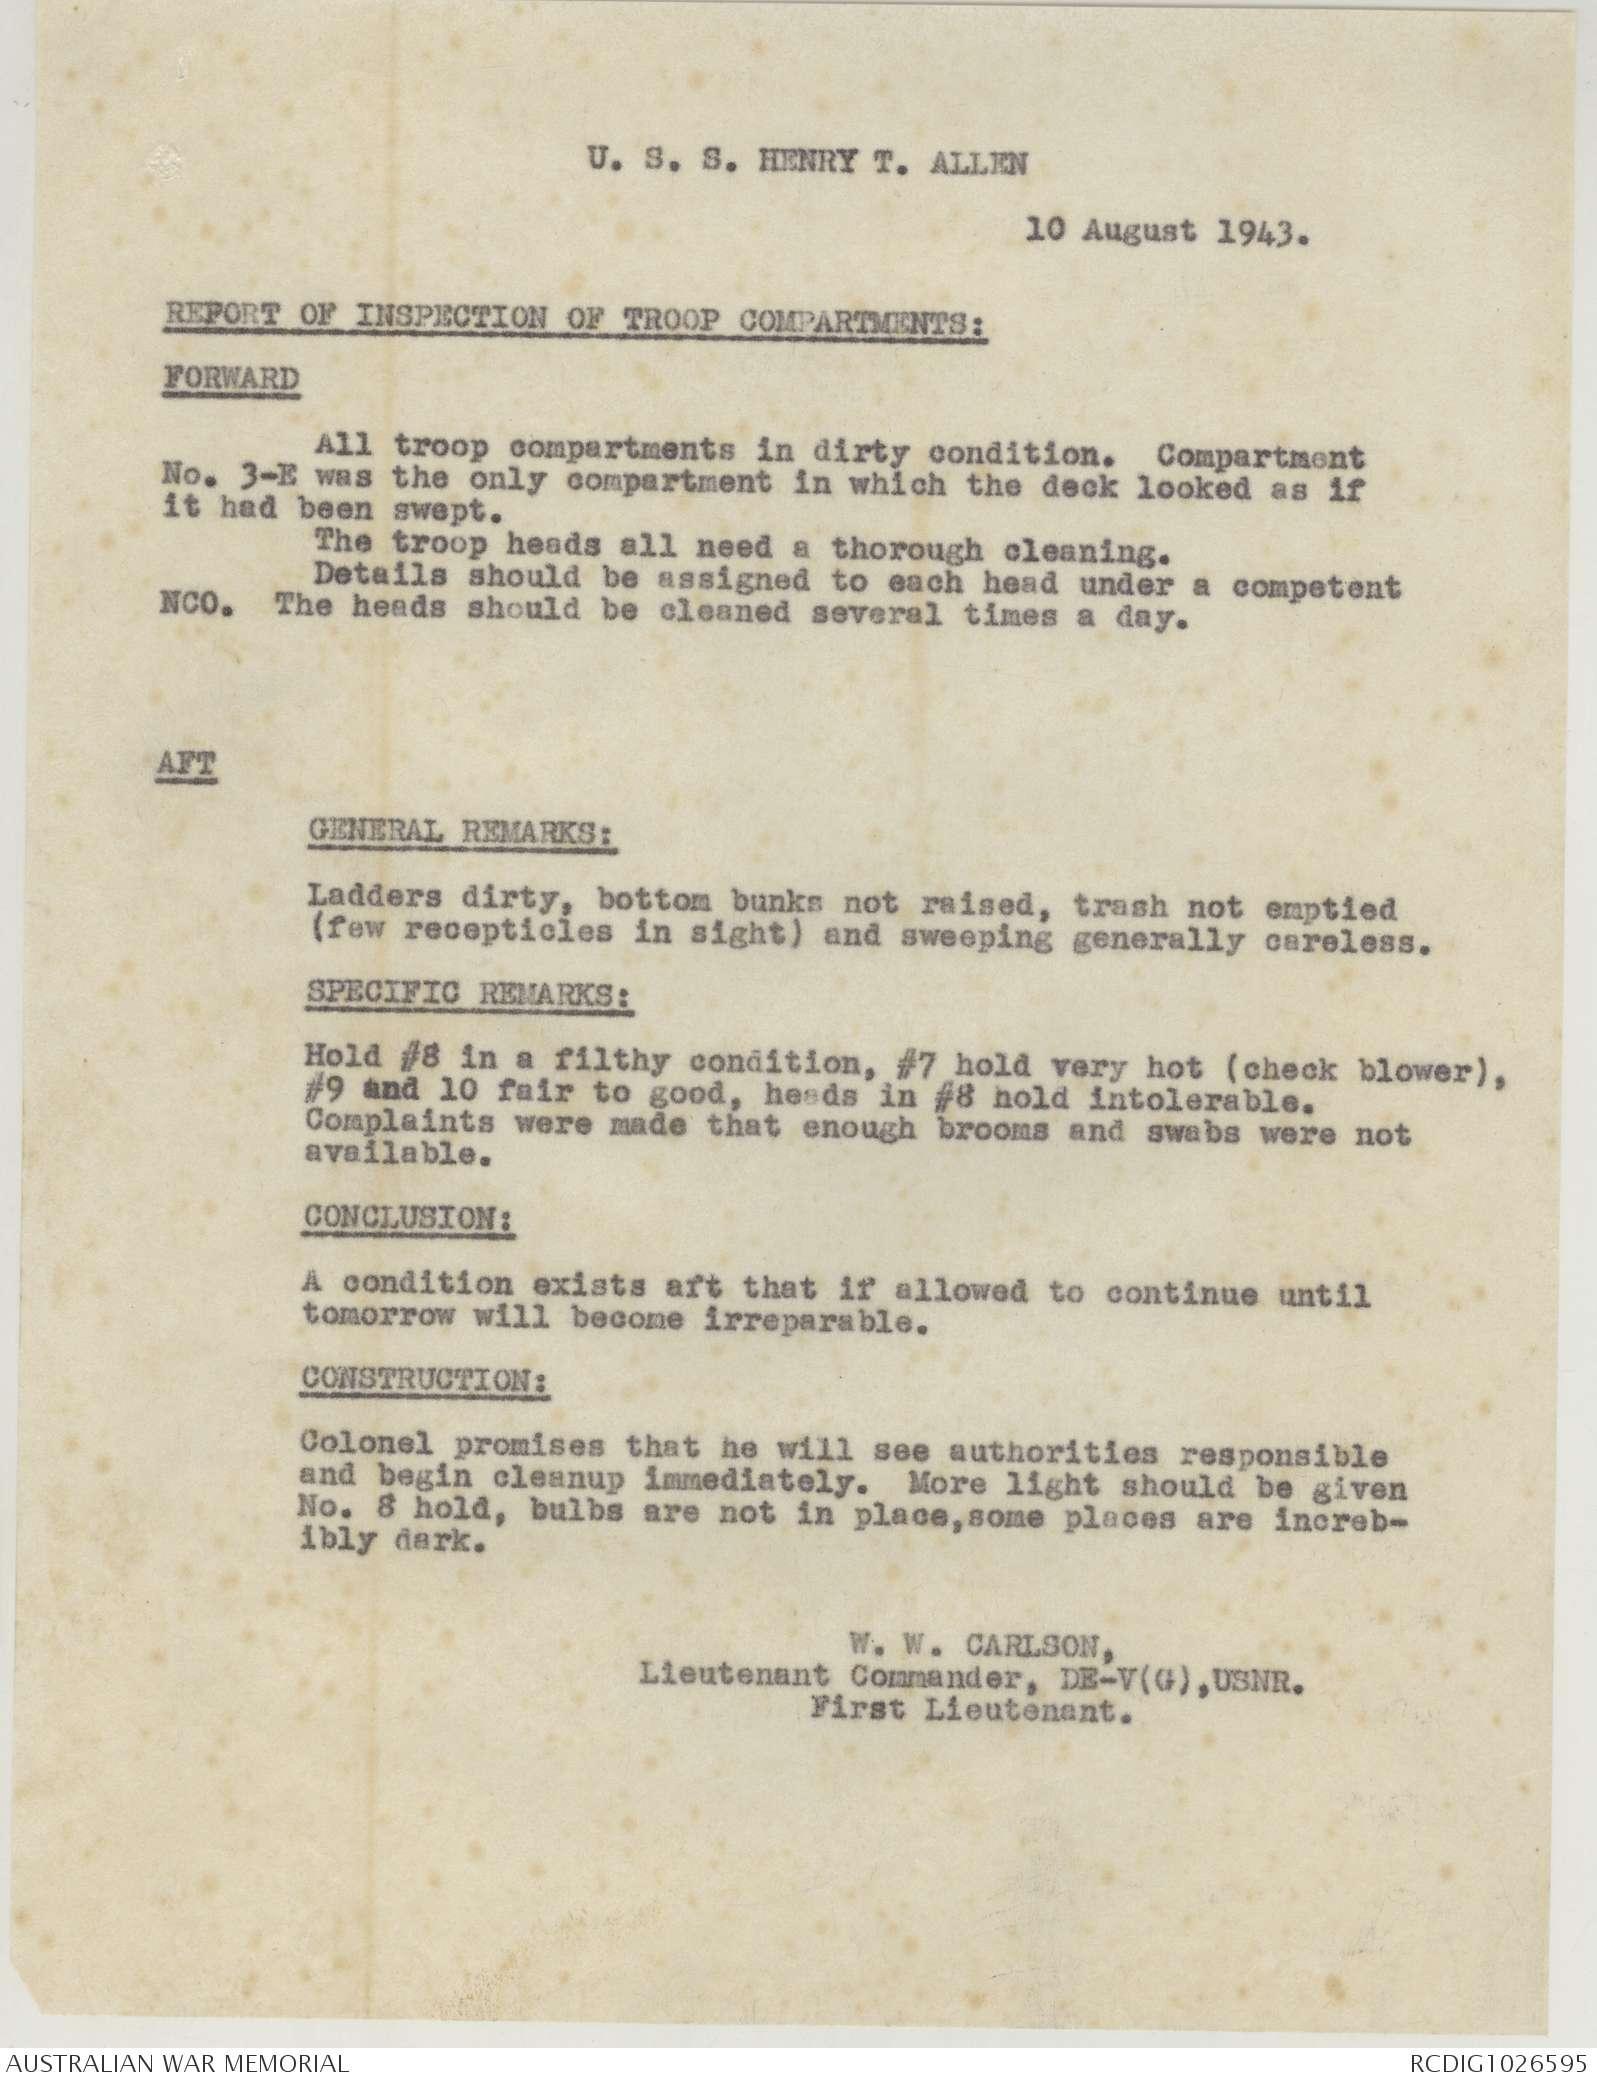 AWM52 8/5/2/30 - August 1943 | The Australian War Memorial